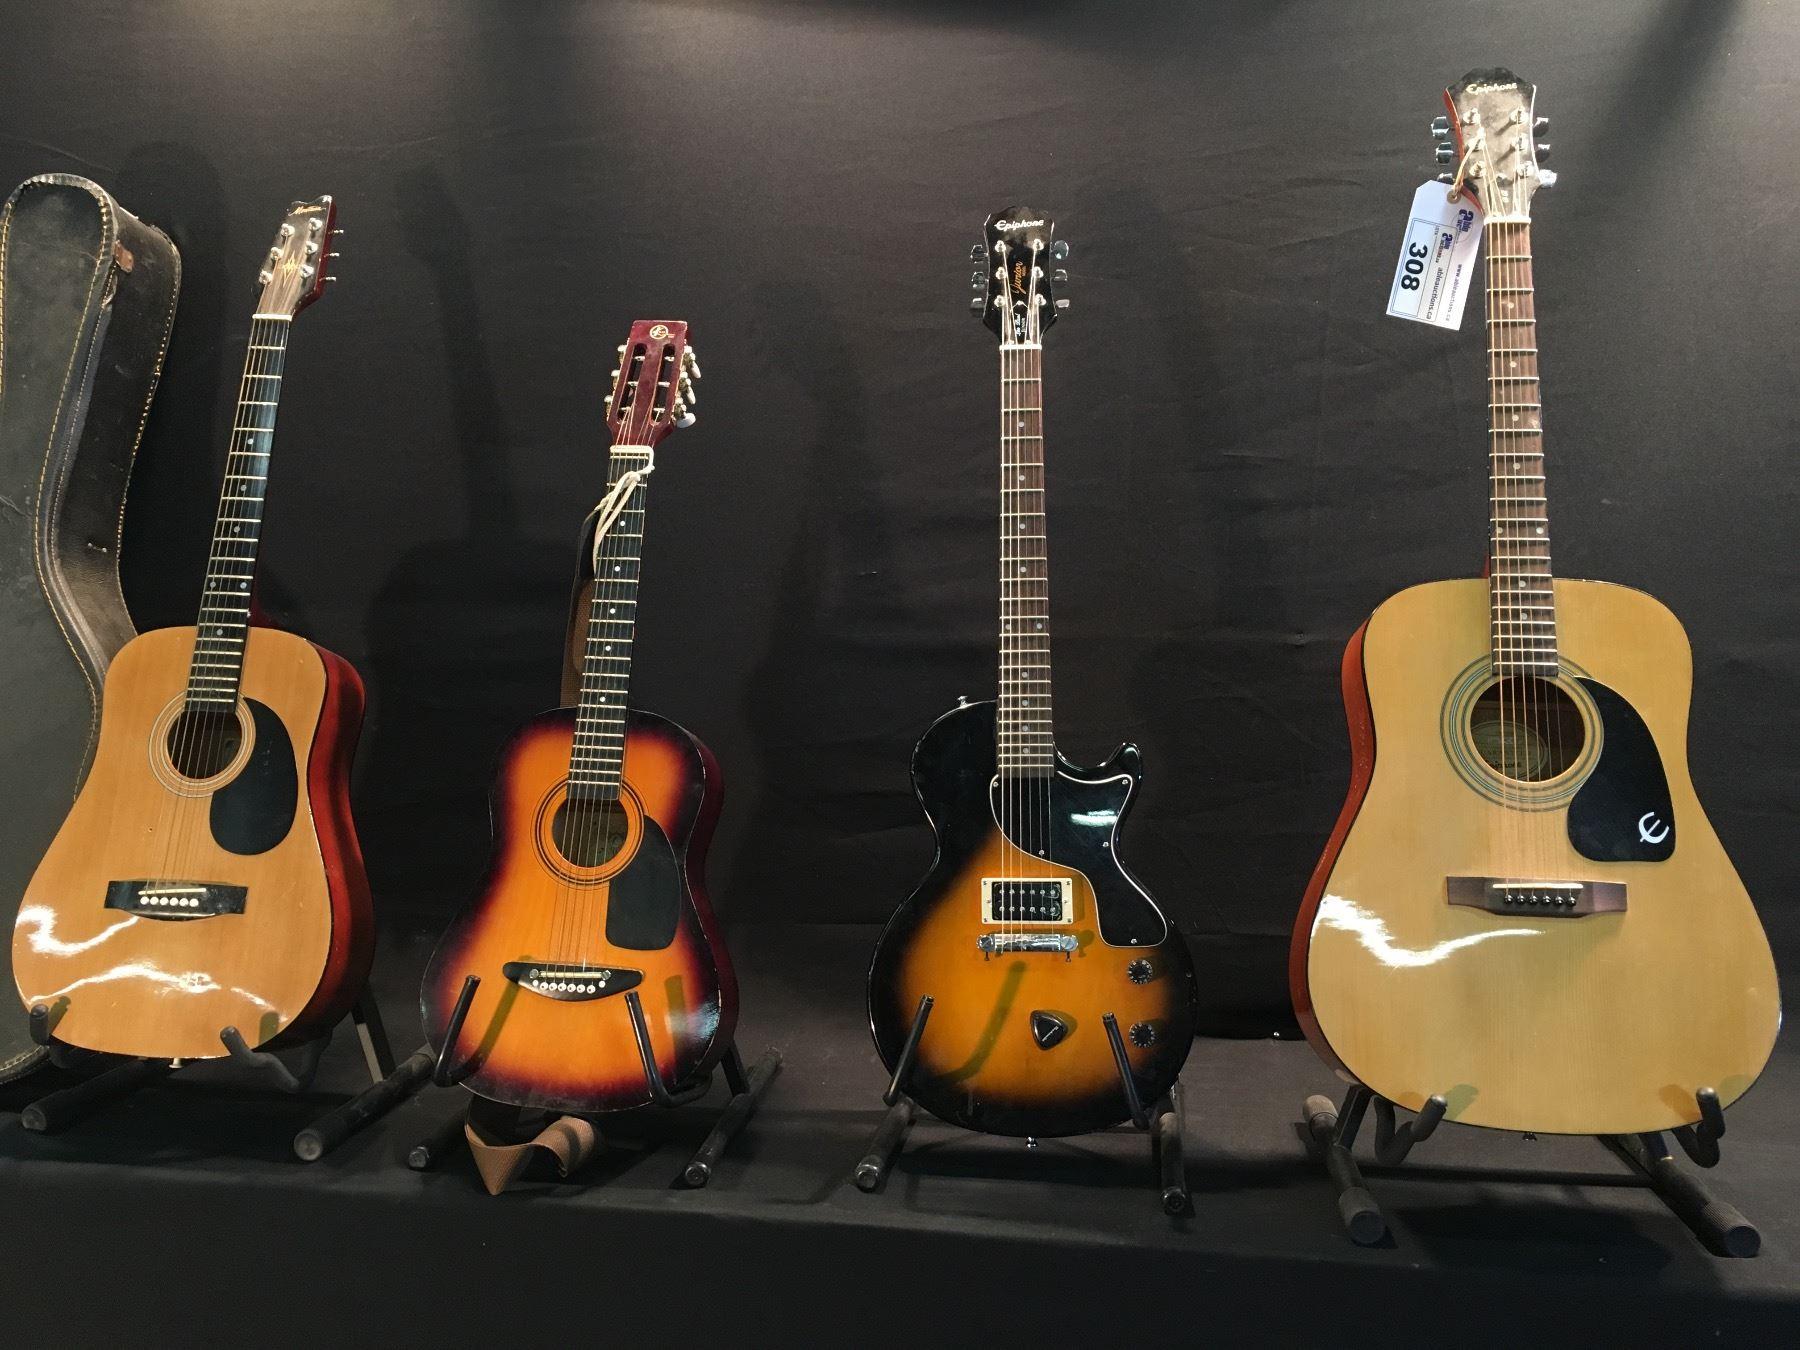 4 GUITARS: EPIPHONE DR-90 ACOUSTIC GUITAR, EPIPHONE LES PAUL